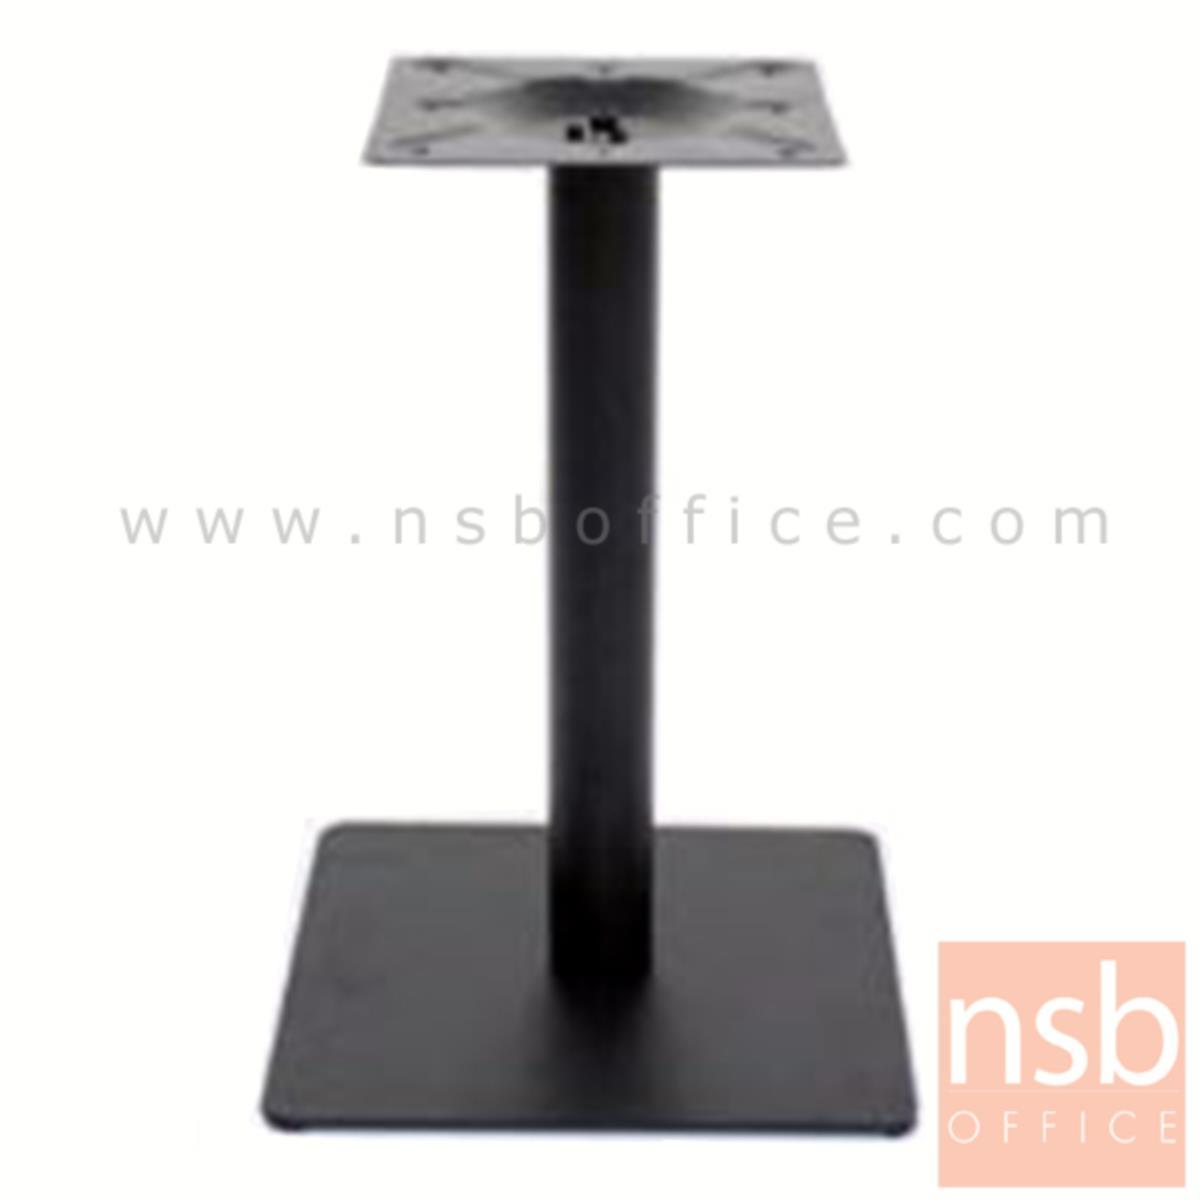 A14A213:ขาโต๊ะบาร์สี่เหลี่ยมแบบแบน SQ-BLACK